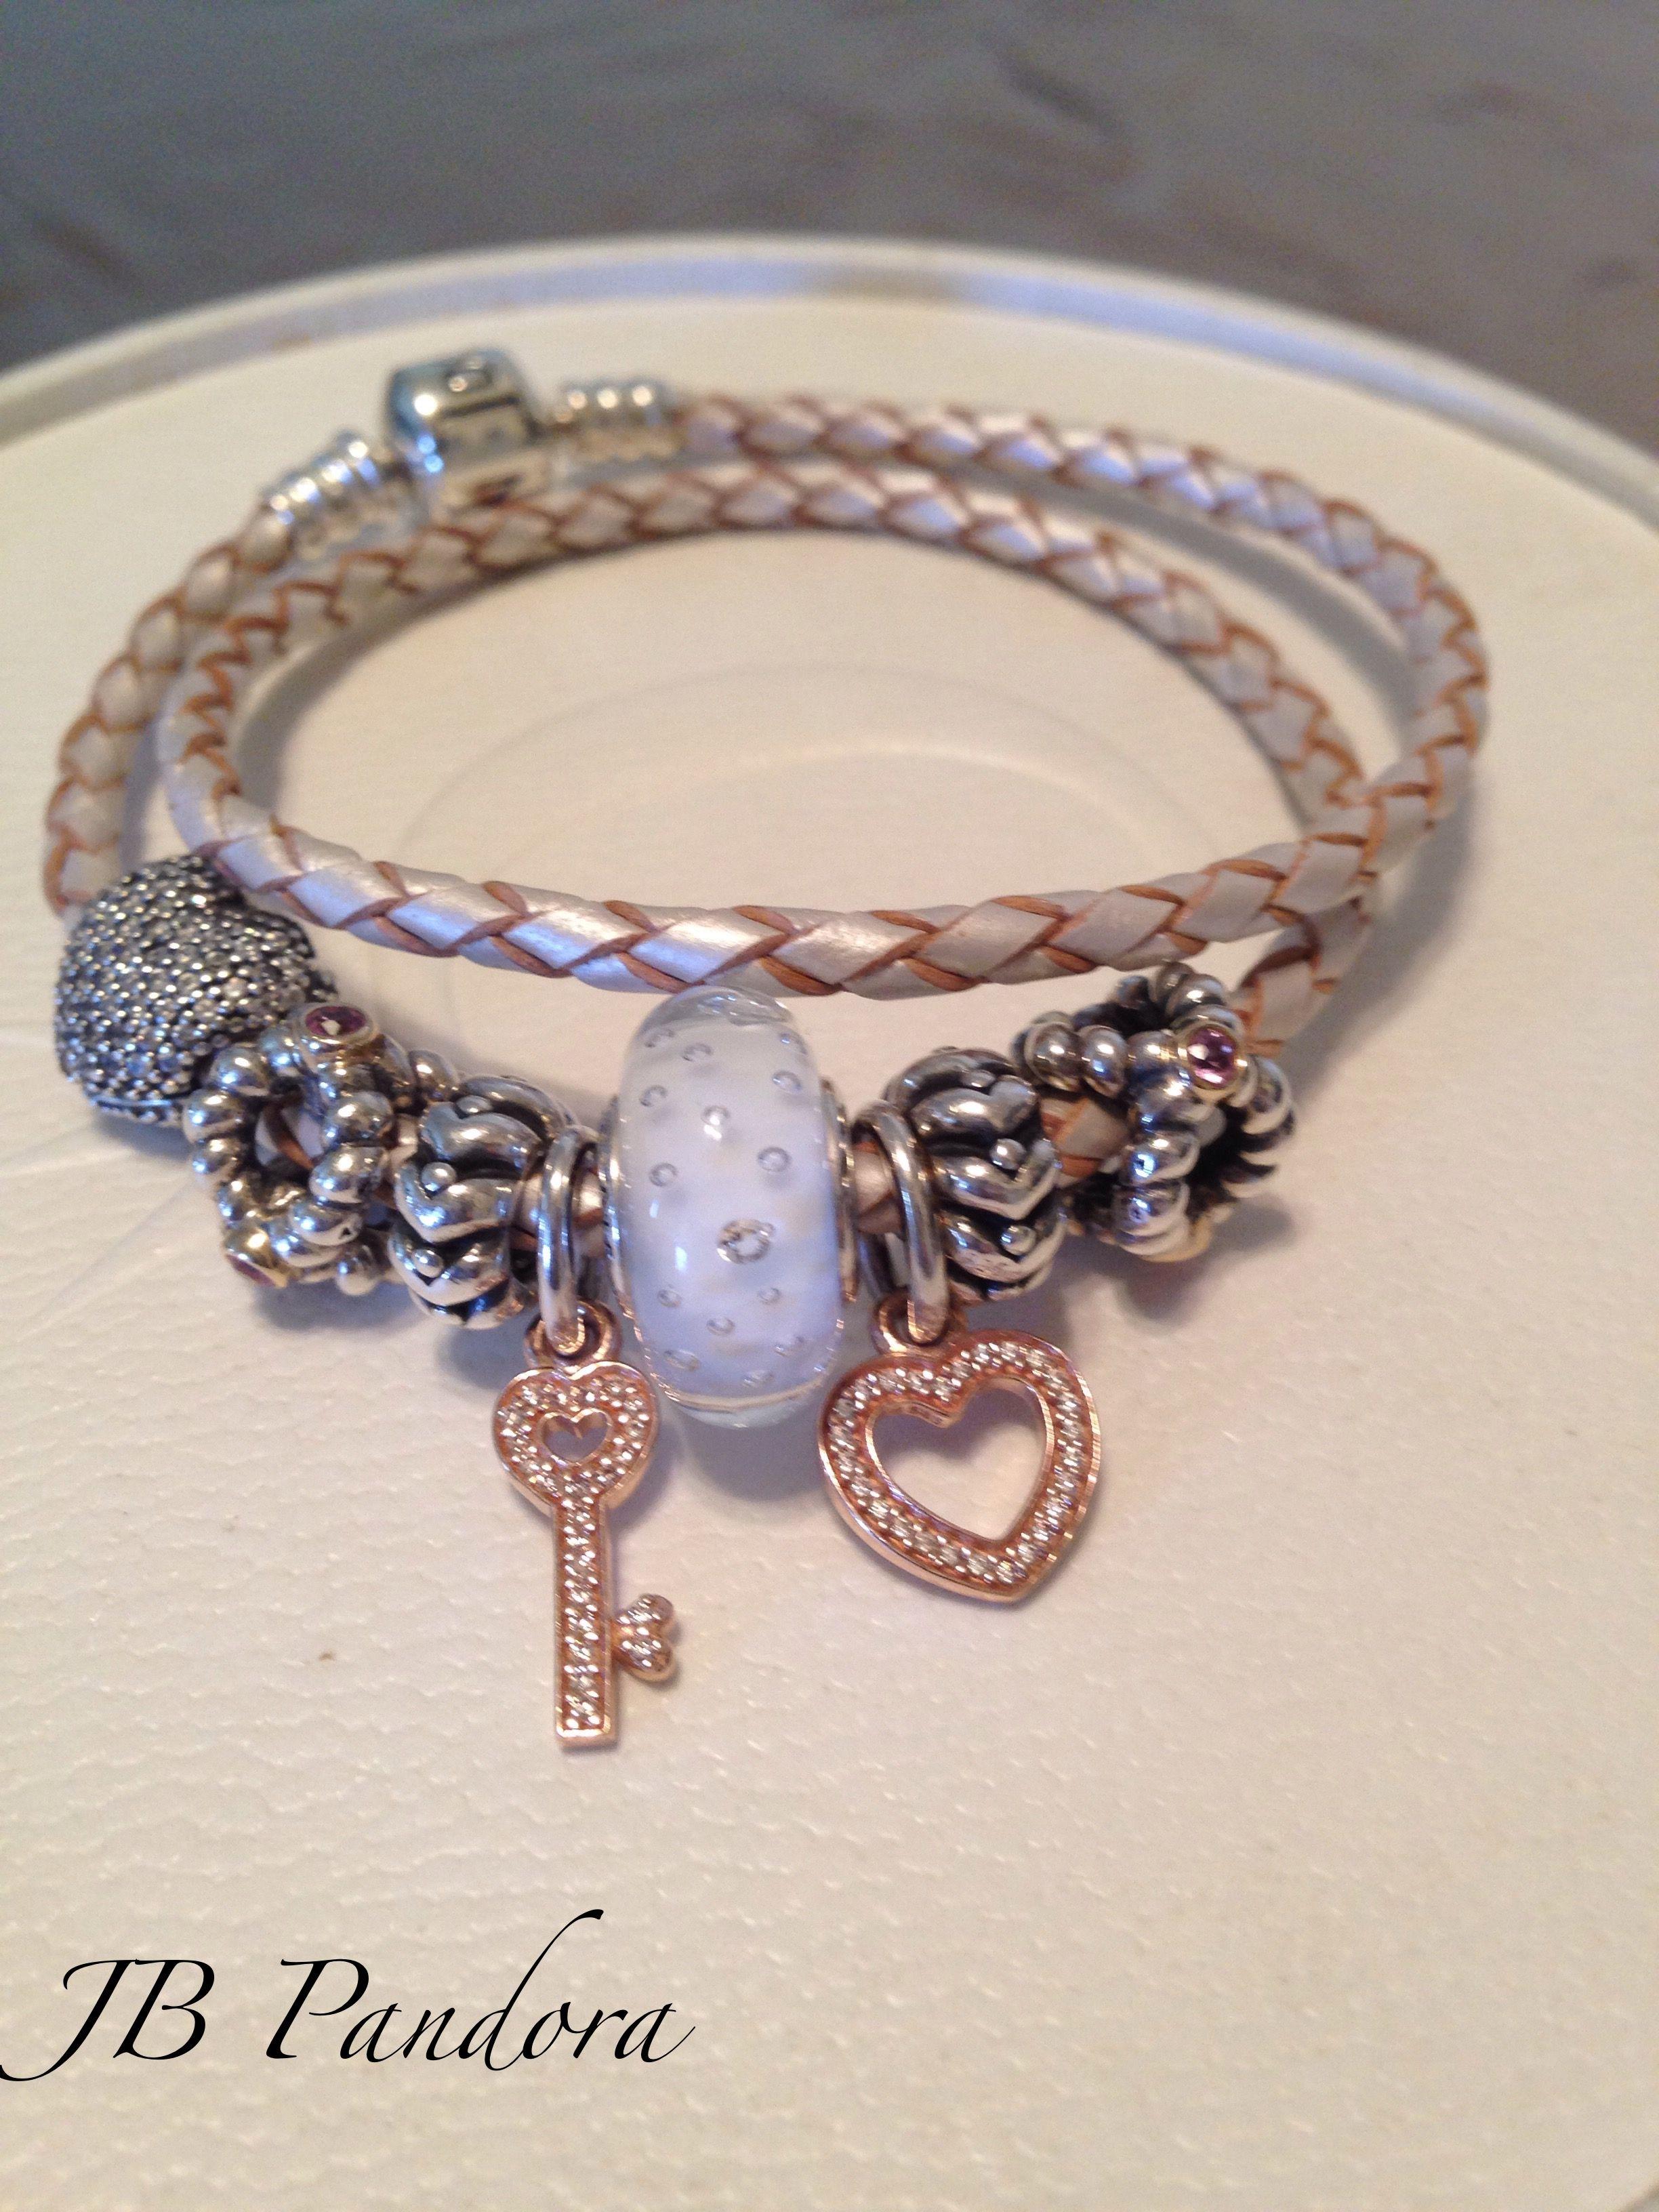 Pandora Champagne Leather Bracelet 14kt Rose Love And Trust Symbols White  Effervescent Murano